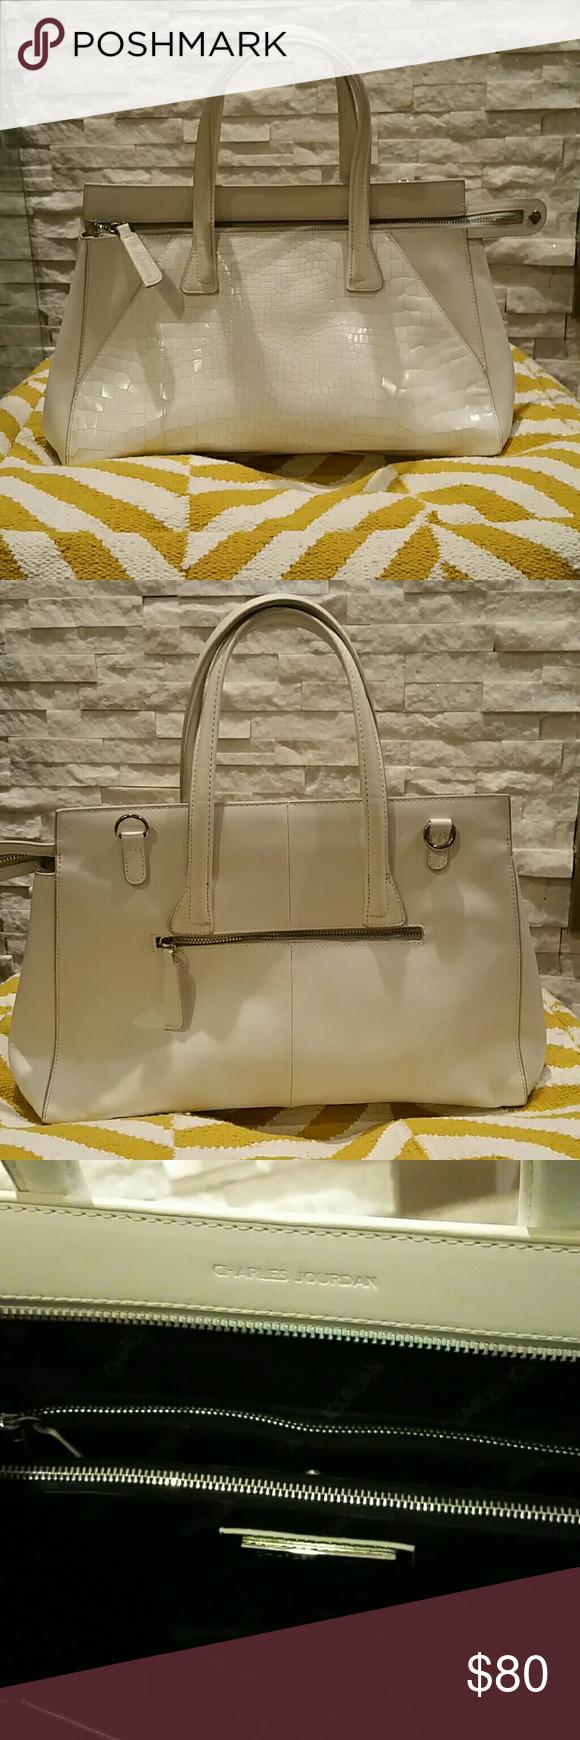 Charles Jourdan handbag Charles Jourdan white leather handbag.  Excellent used condition.  Shoulder strap and dust bag included. Charles Jourdan Bags Totes